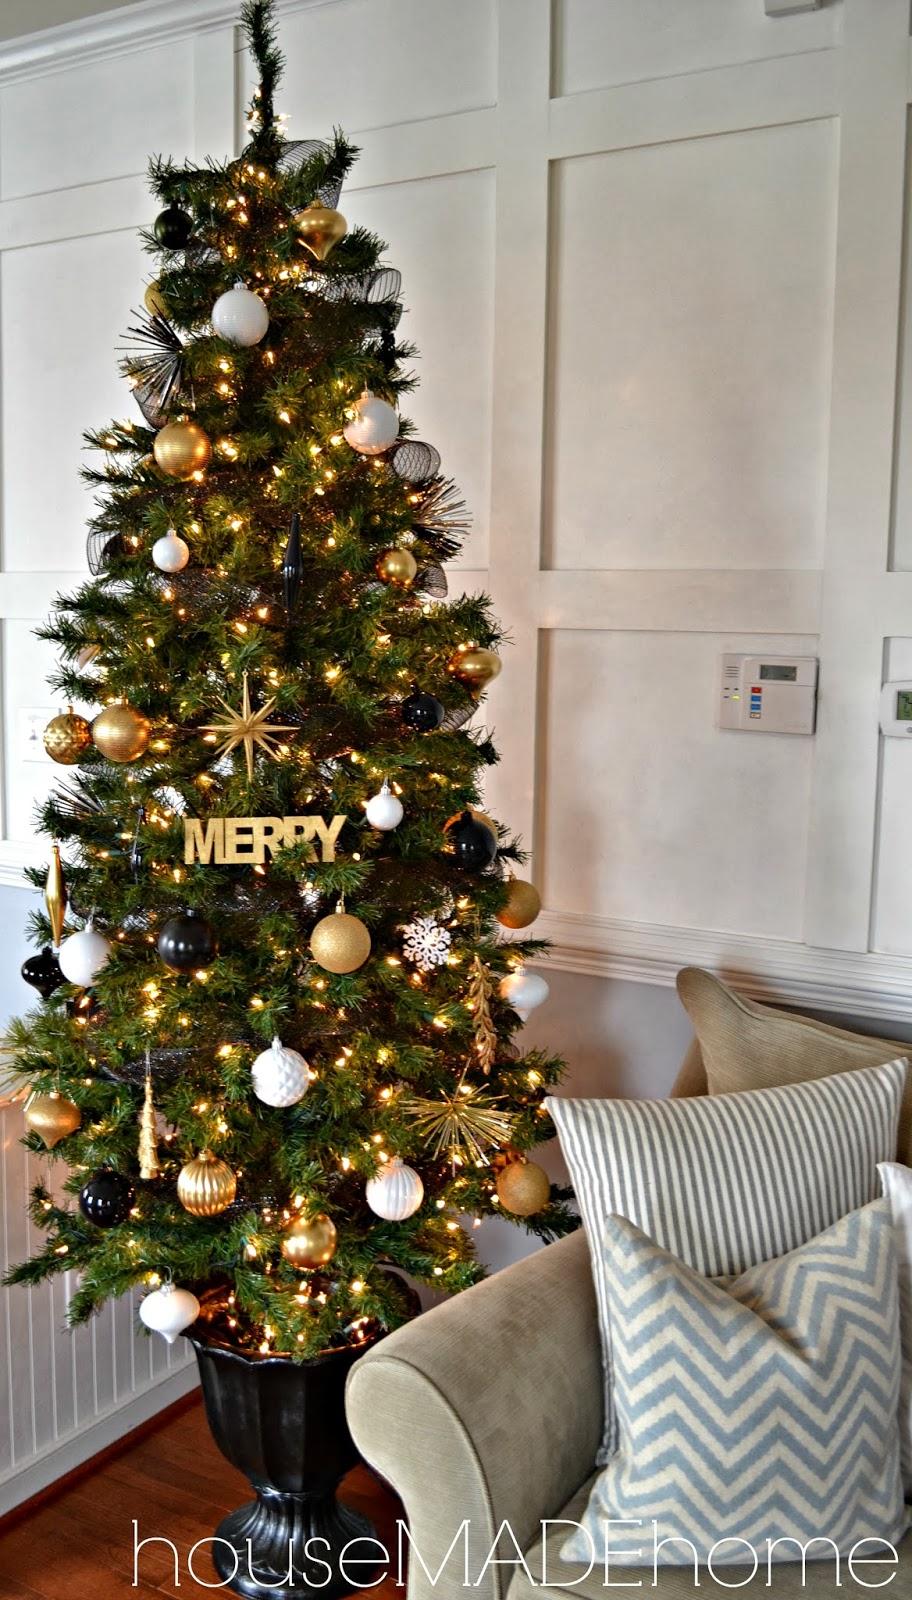 HMH Designs: A Modern Glam Christmas Home Tour